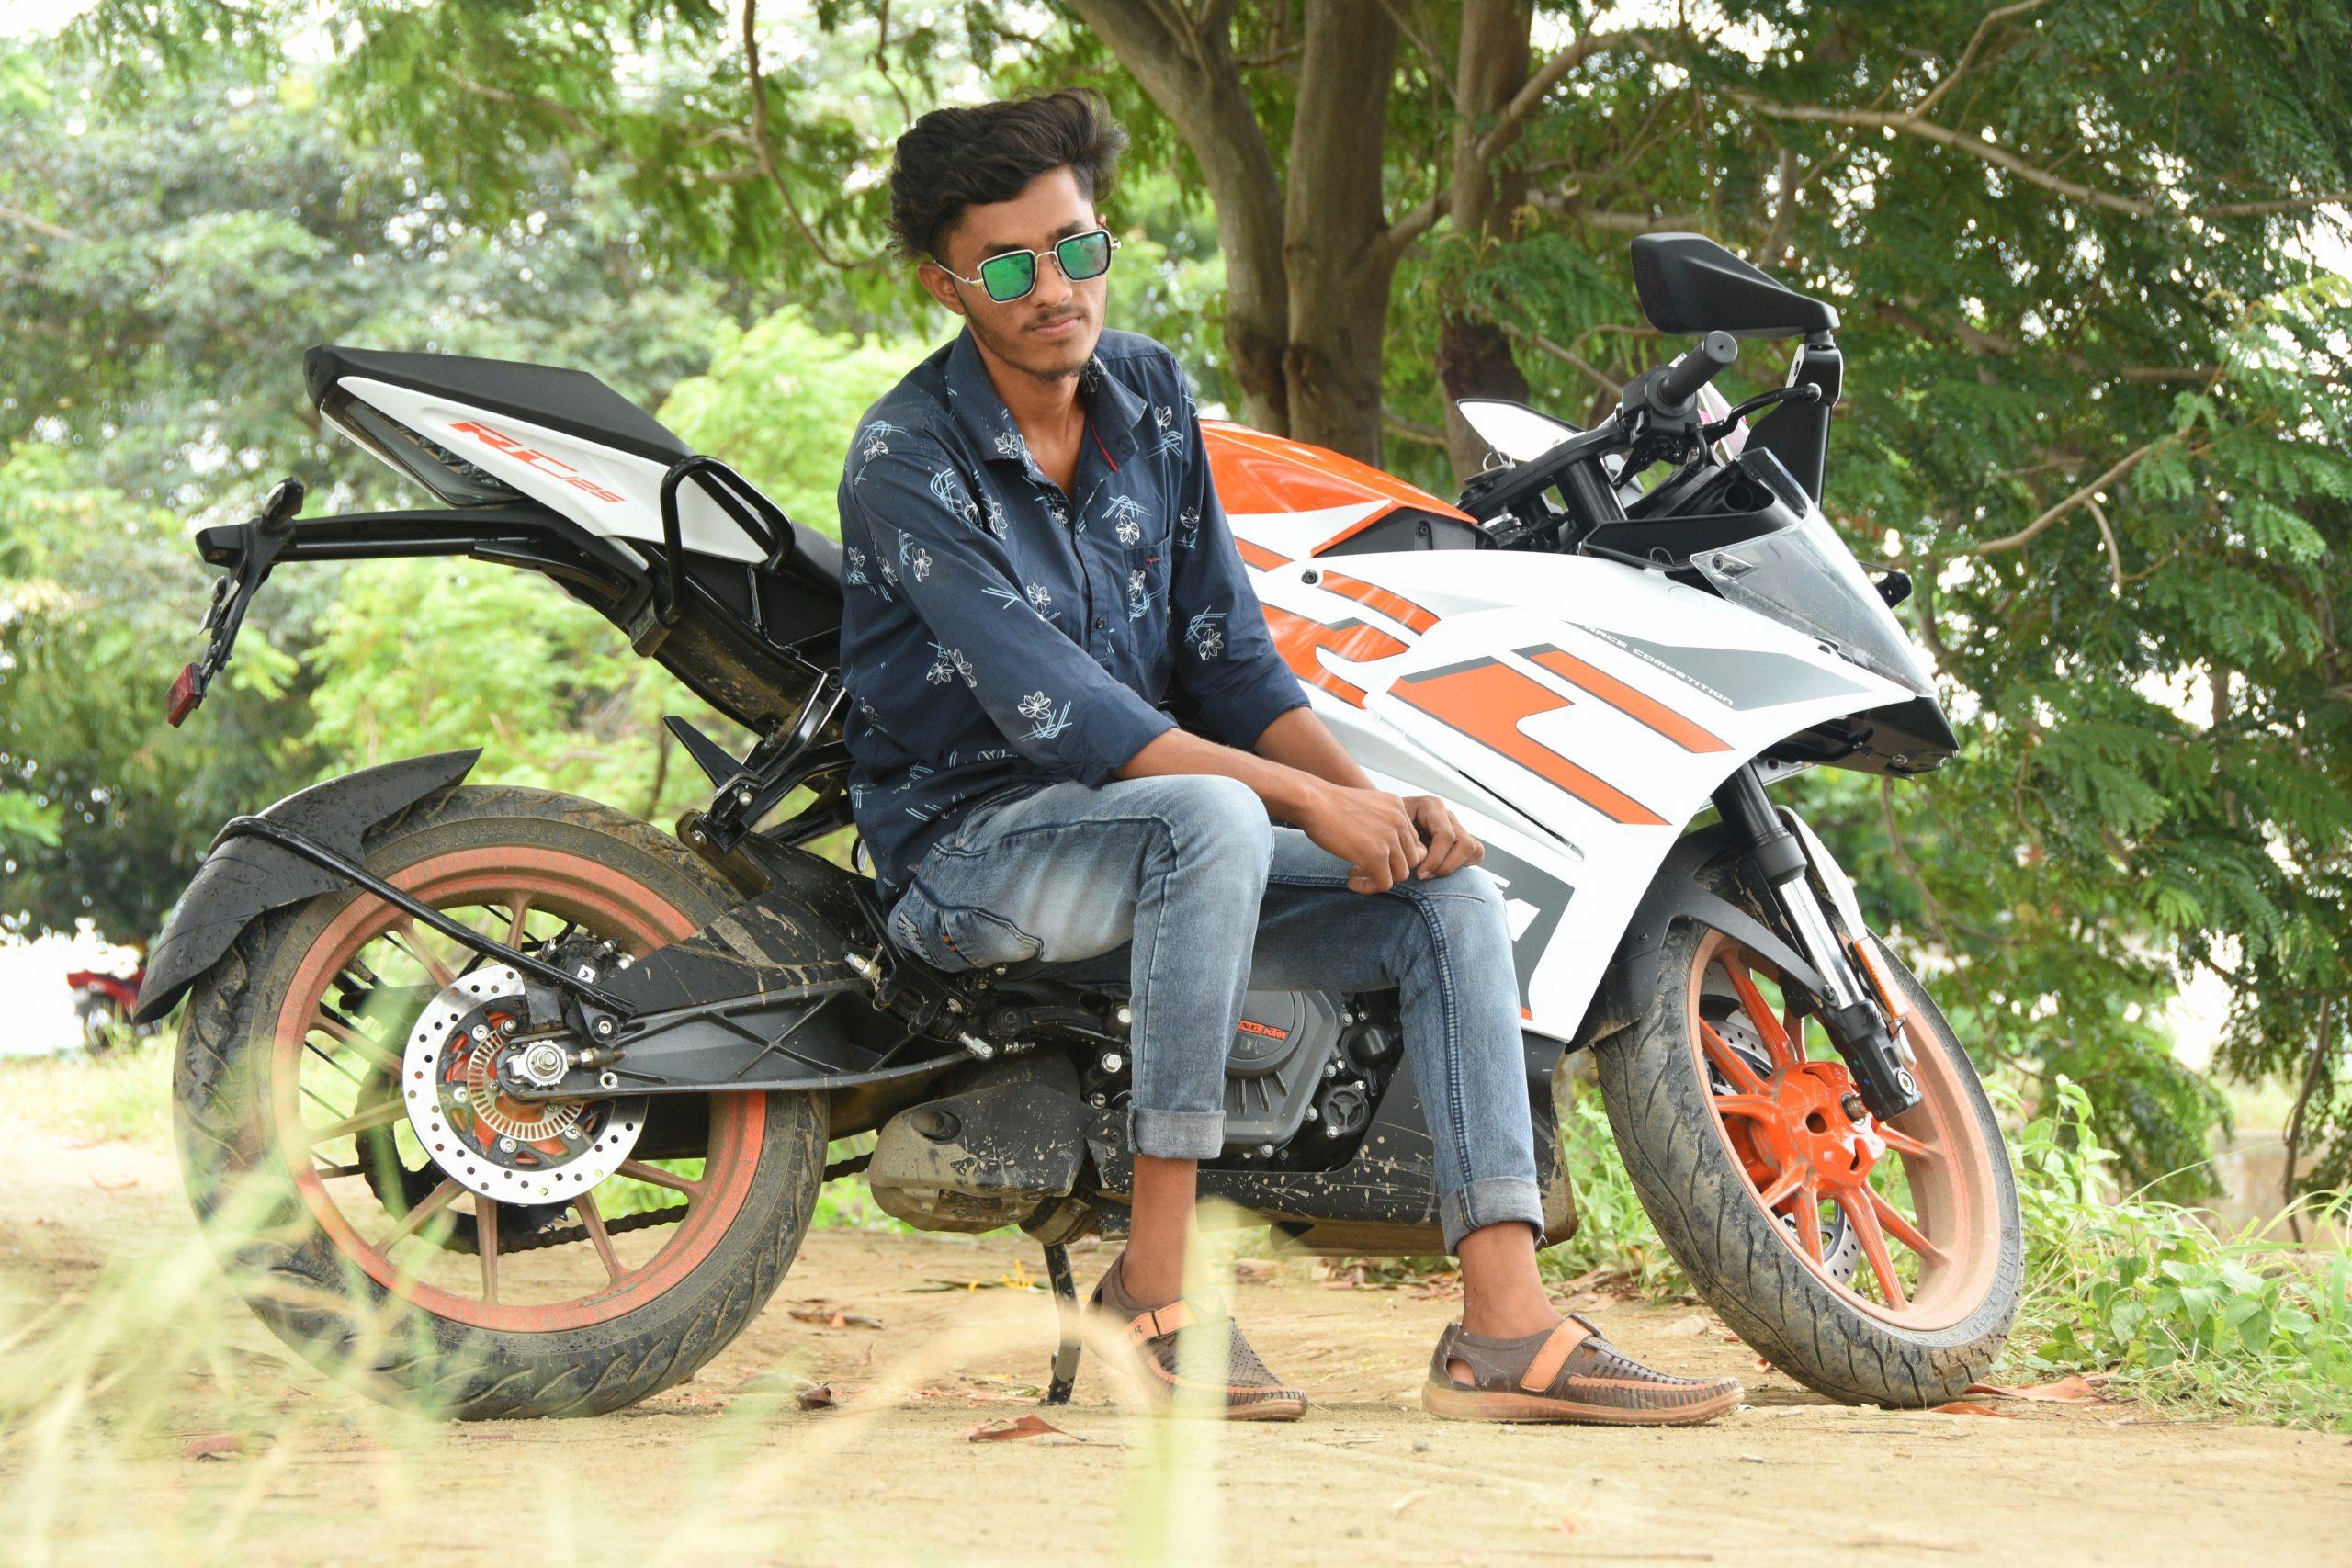 Boy posing on bike